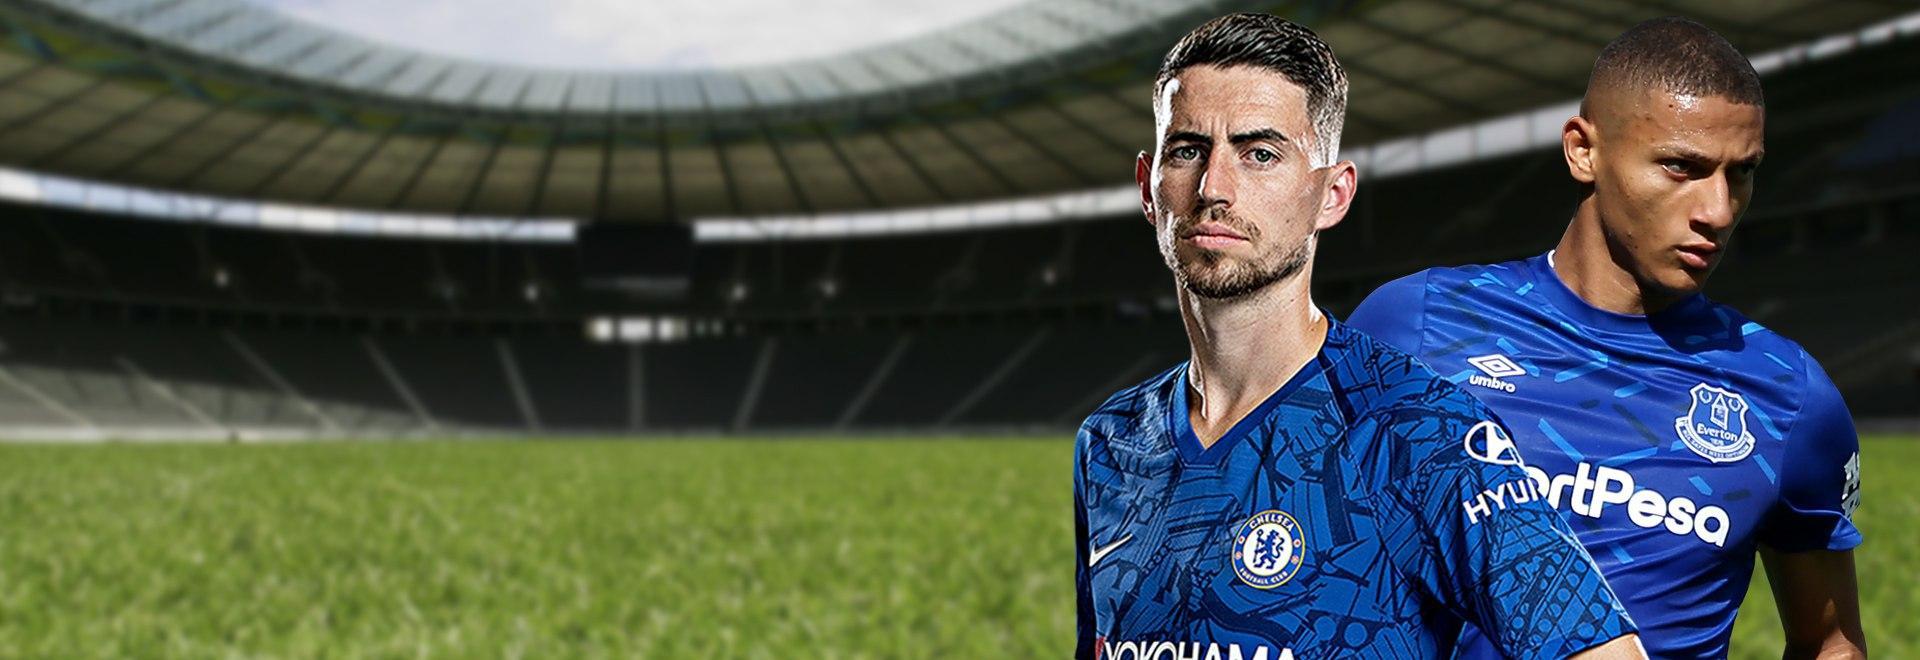 Chelsea - Everton. 29a g.